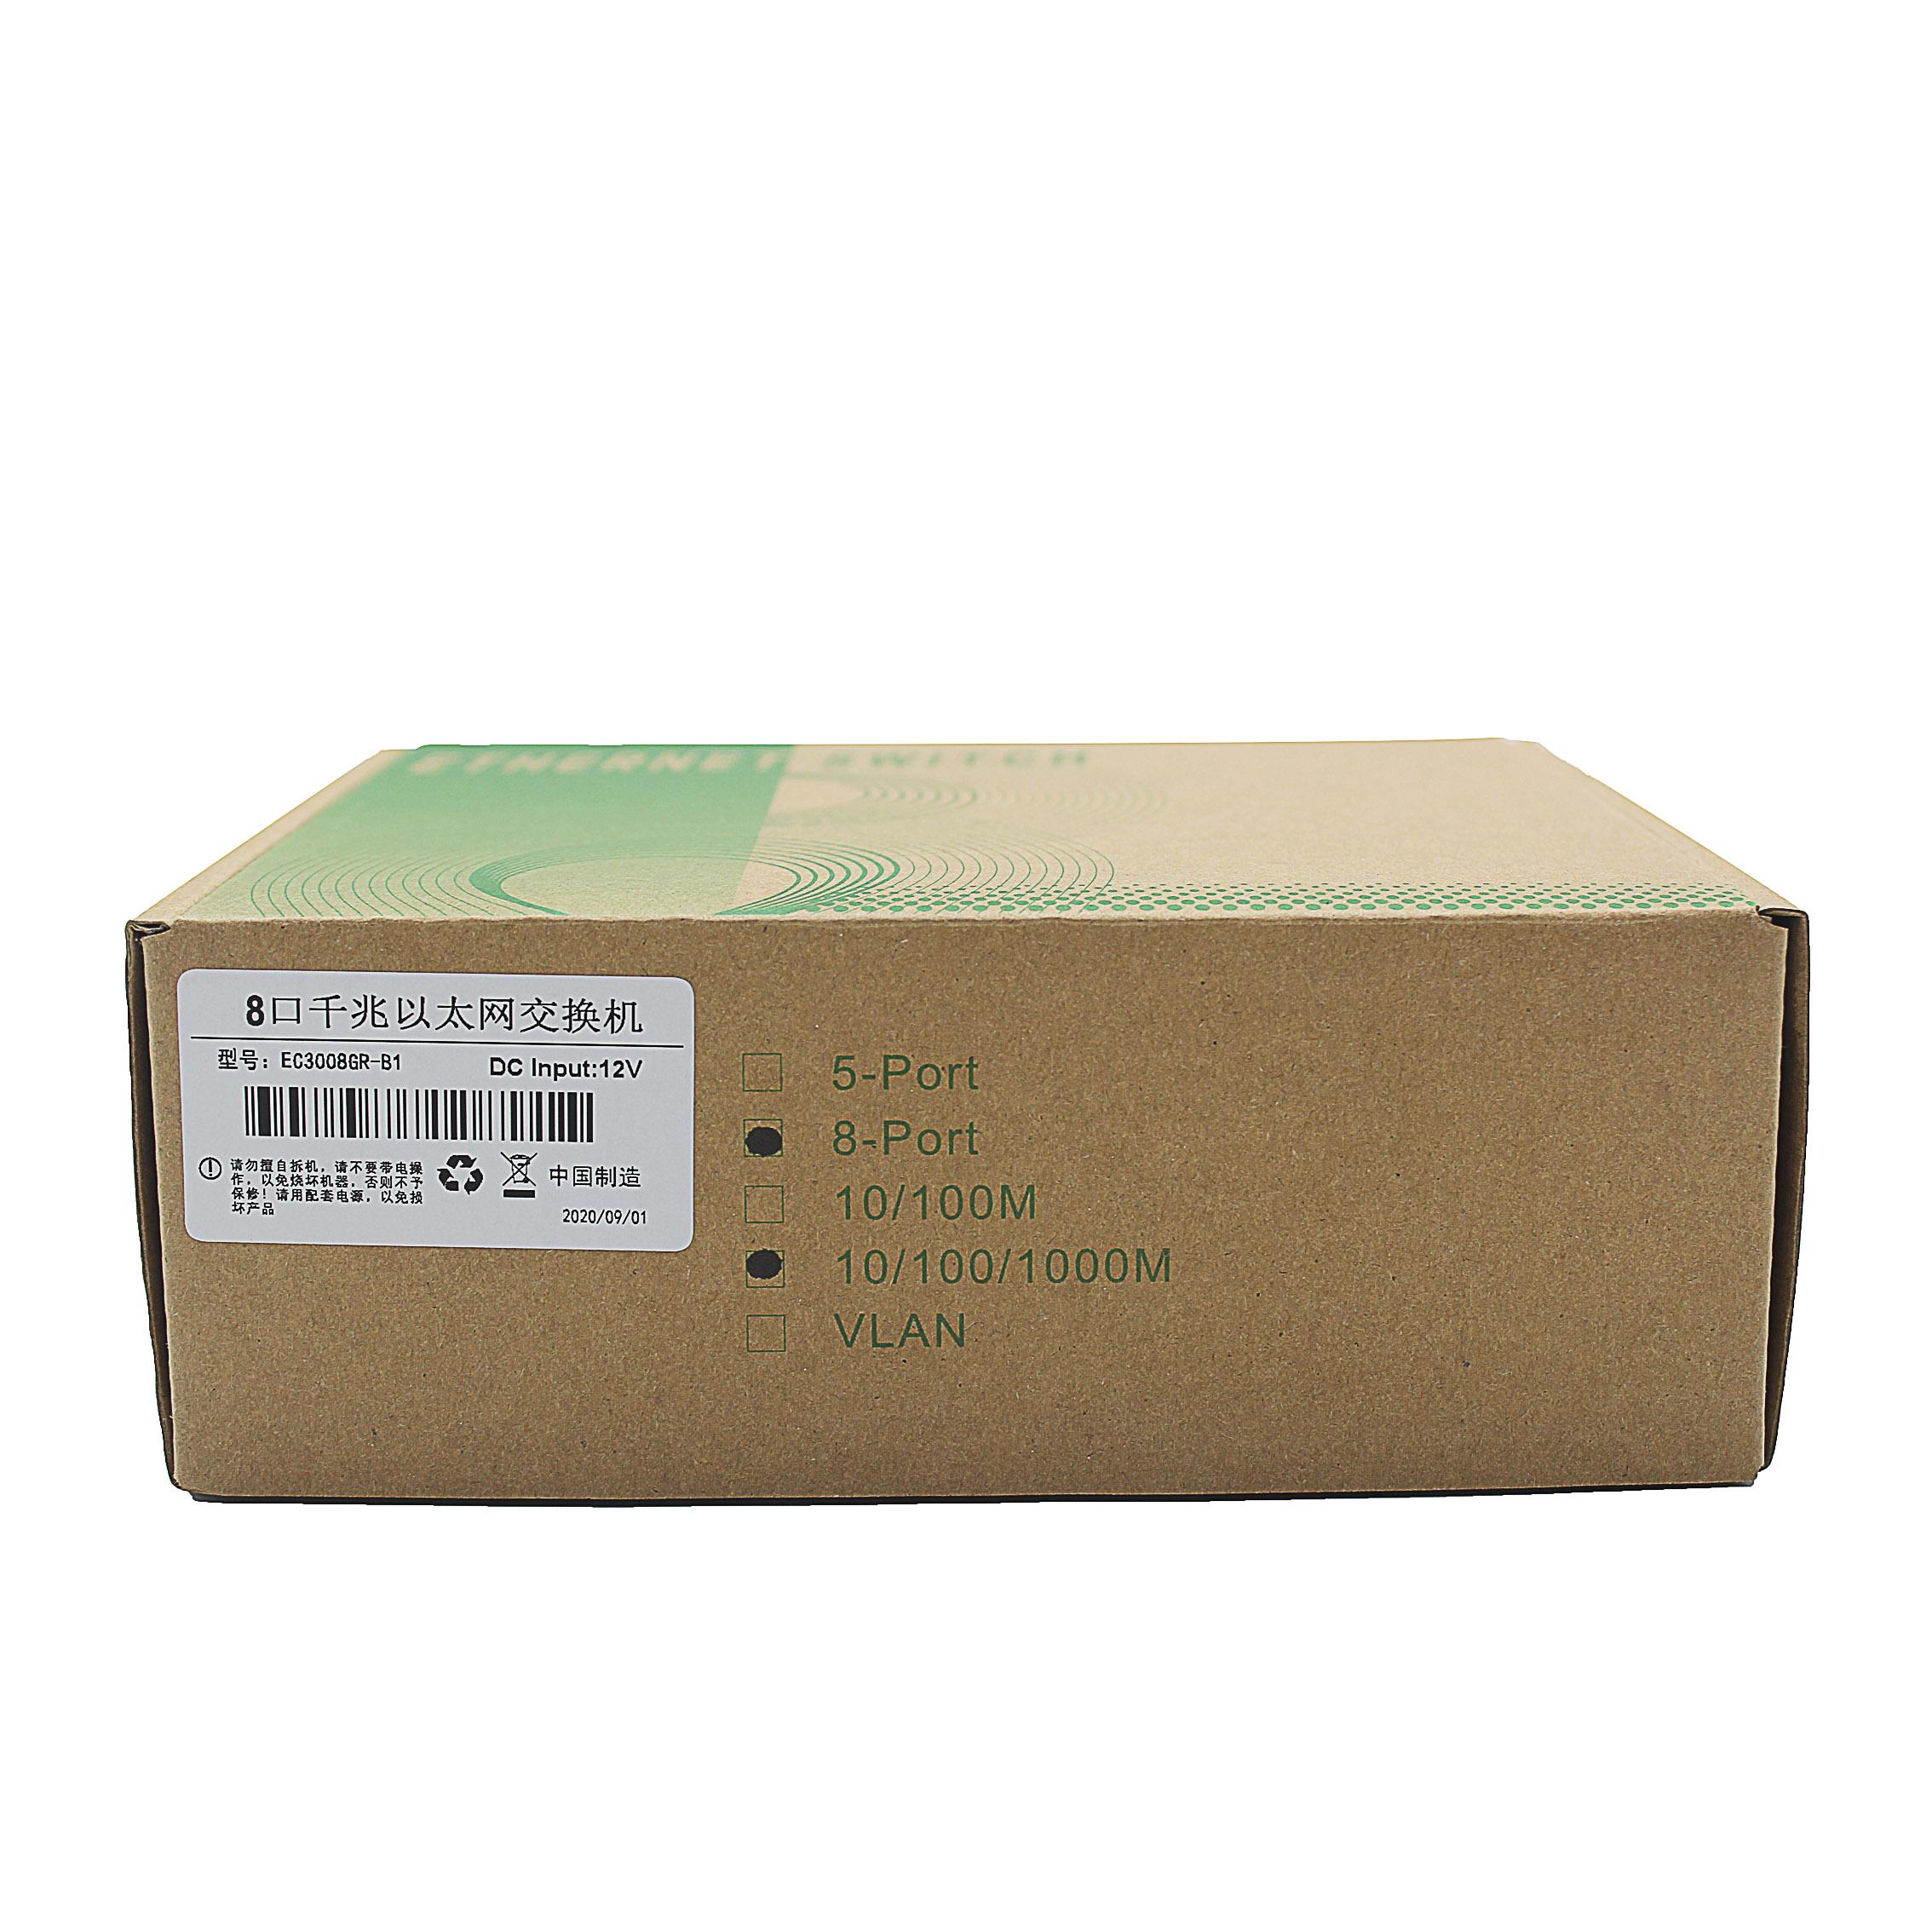 2108S 8GE switch box-1